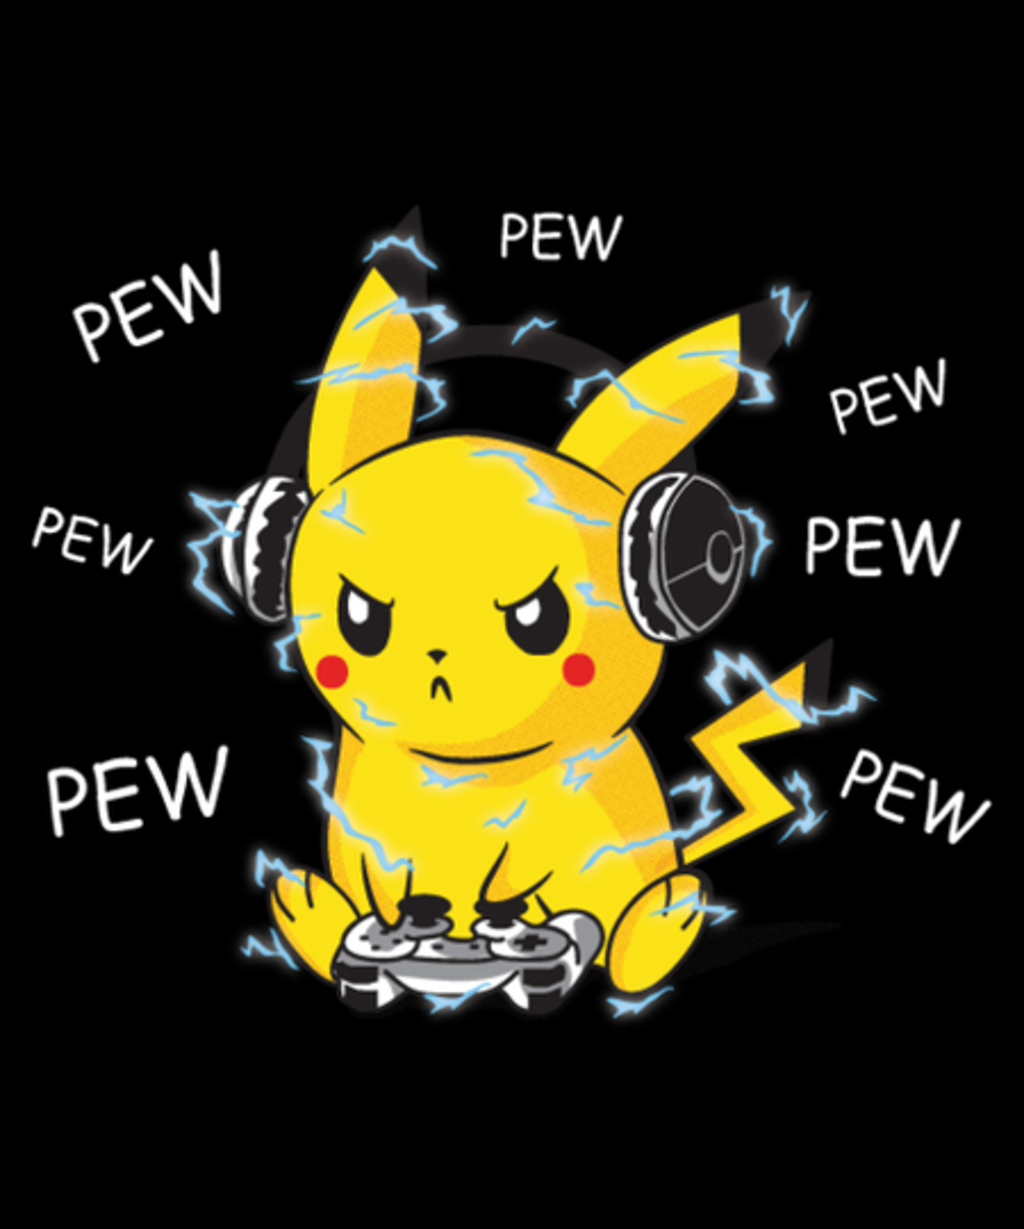 Qwertee: pew pew pew-kachu